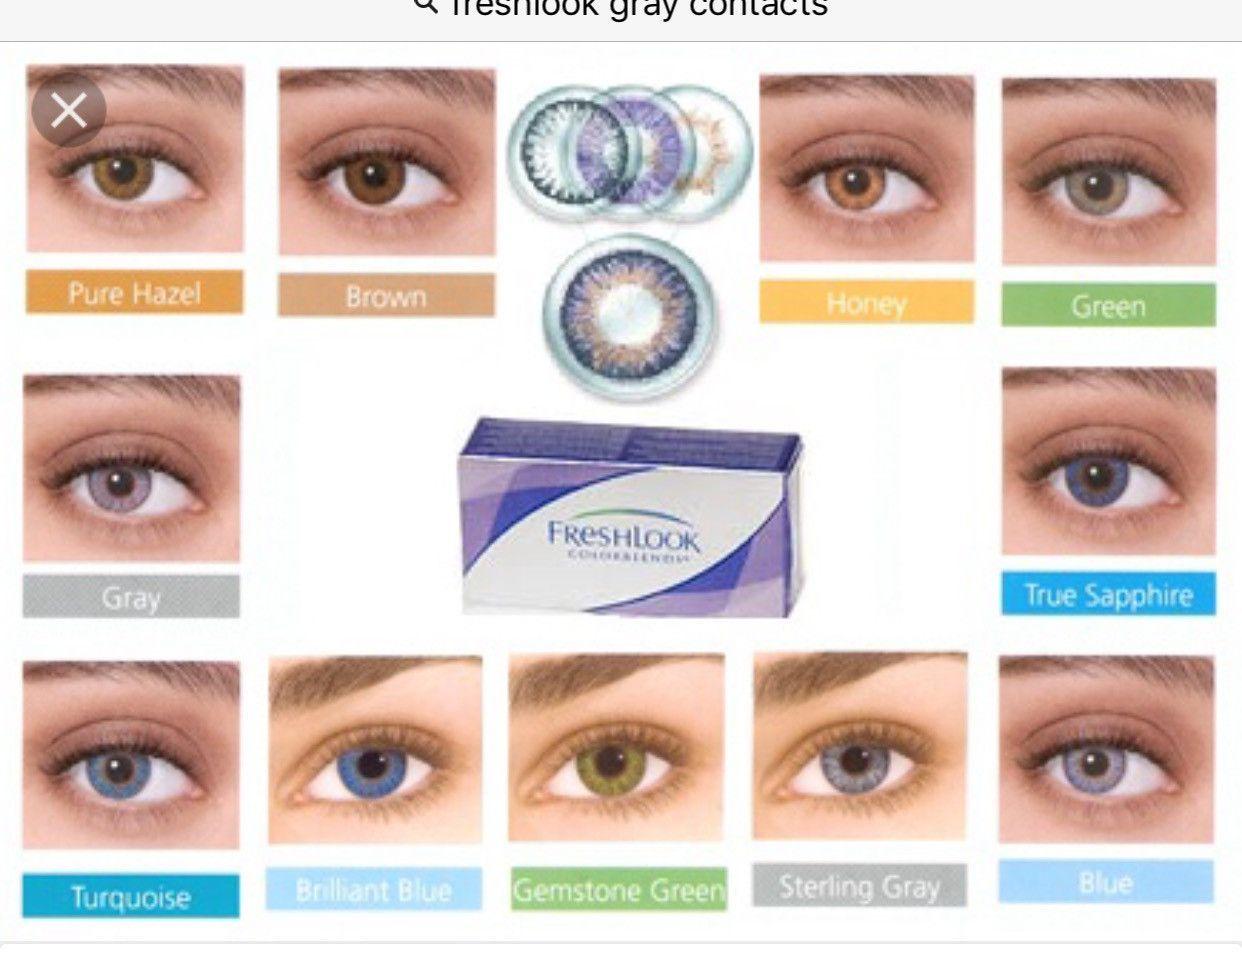 Color contacts prescription colored contacts color contacts and color contacts nvjuhfo Images